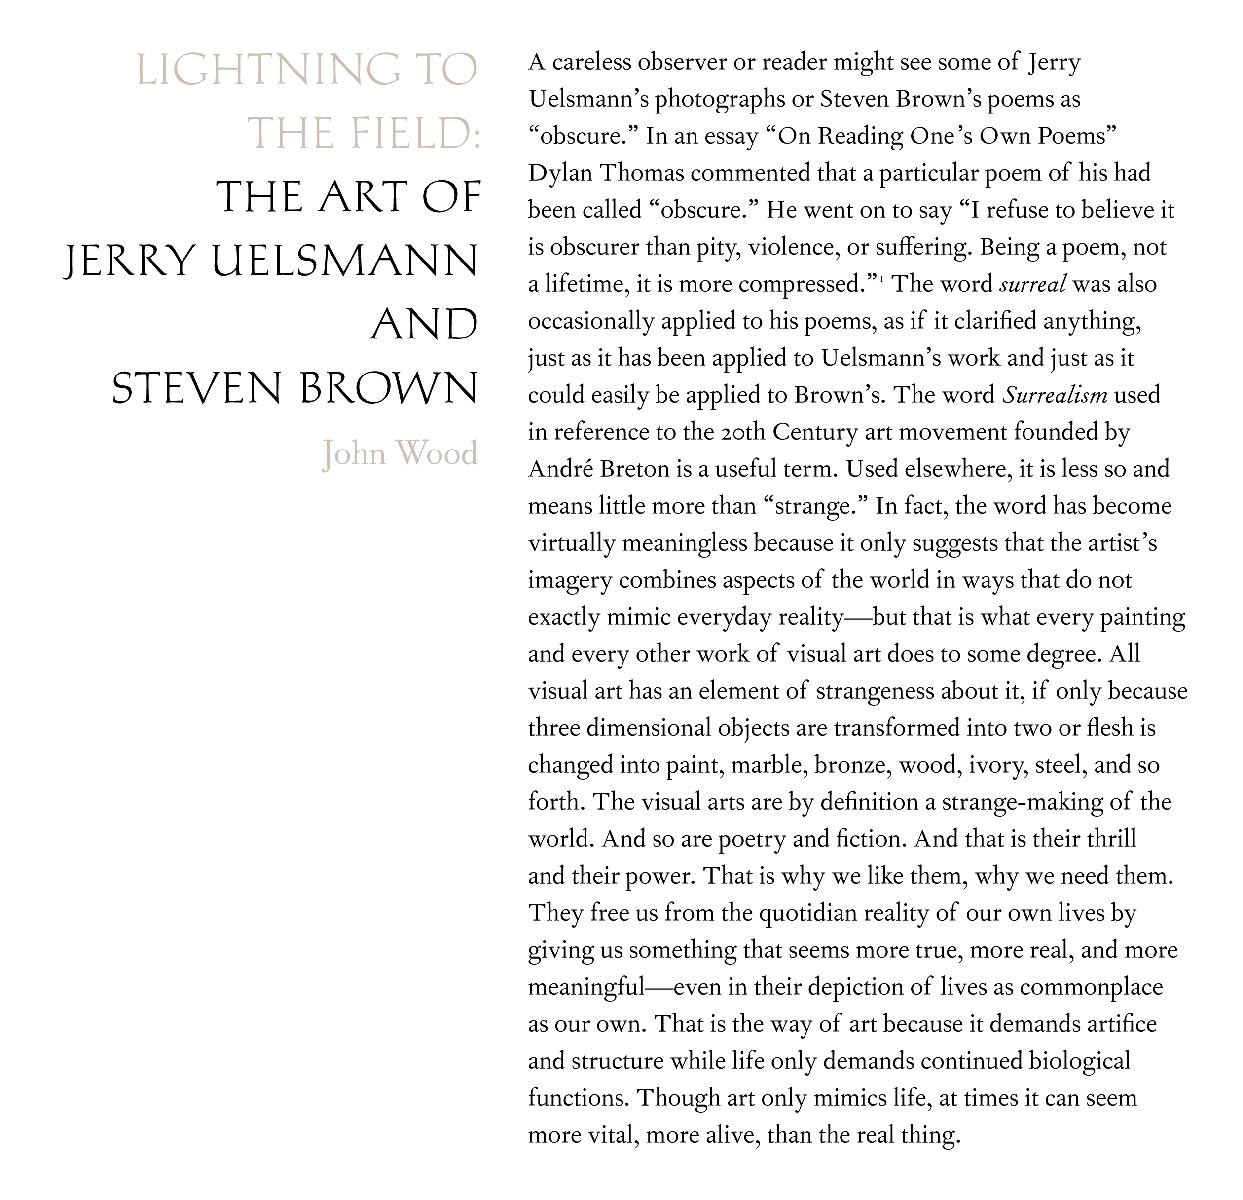 Steven Brown, Moth and Bonelight